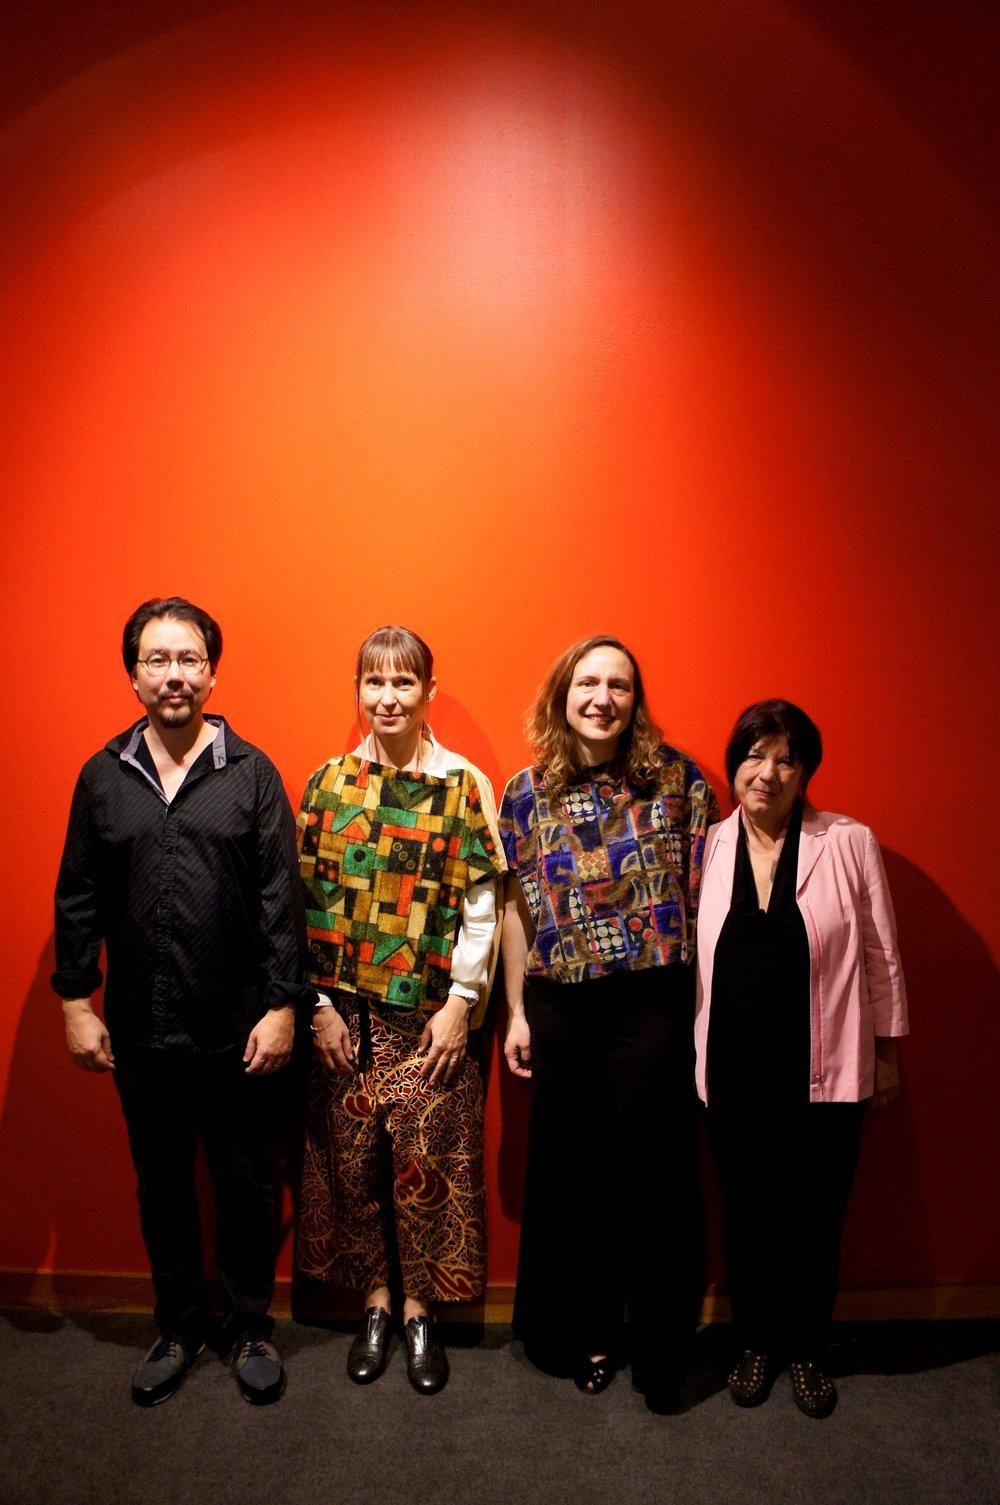 from left to right: eyvind kang, silvia tarozzi (in green block cloth shirt), deborah walker (in blue block cloth shirt), pascale criton